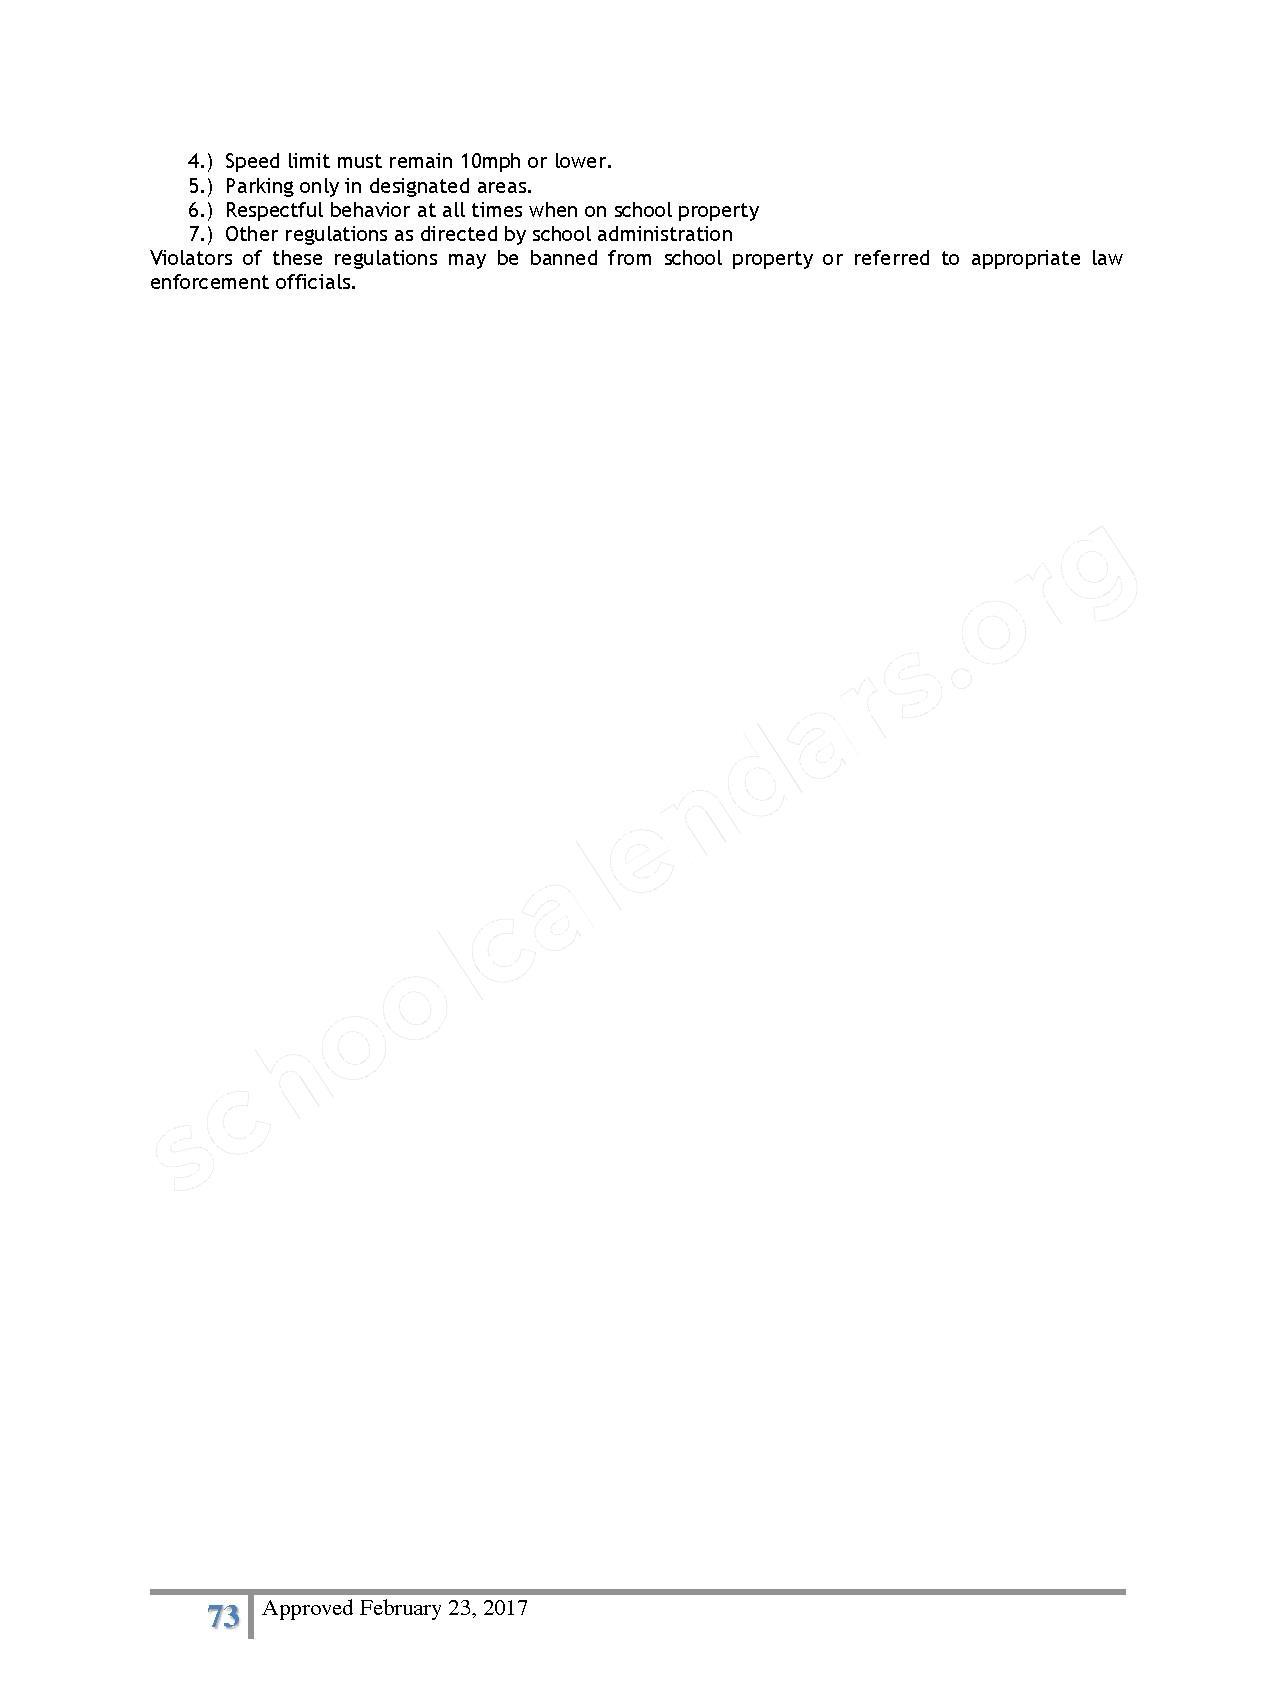 2016 - 2017 District Calendar – Lisa Academy Public Charter Schools – page 73